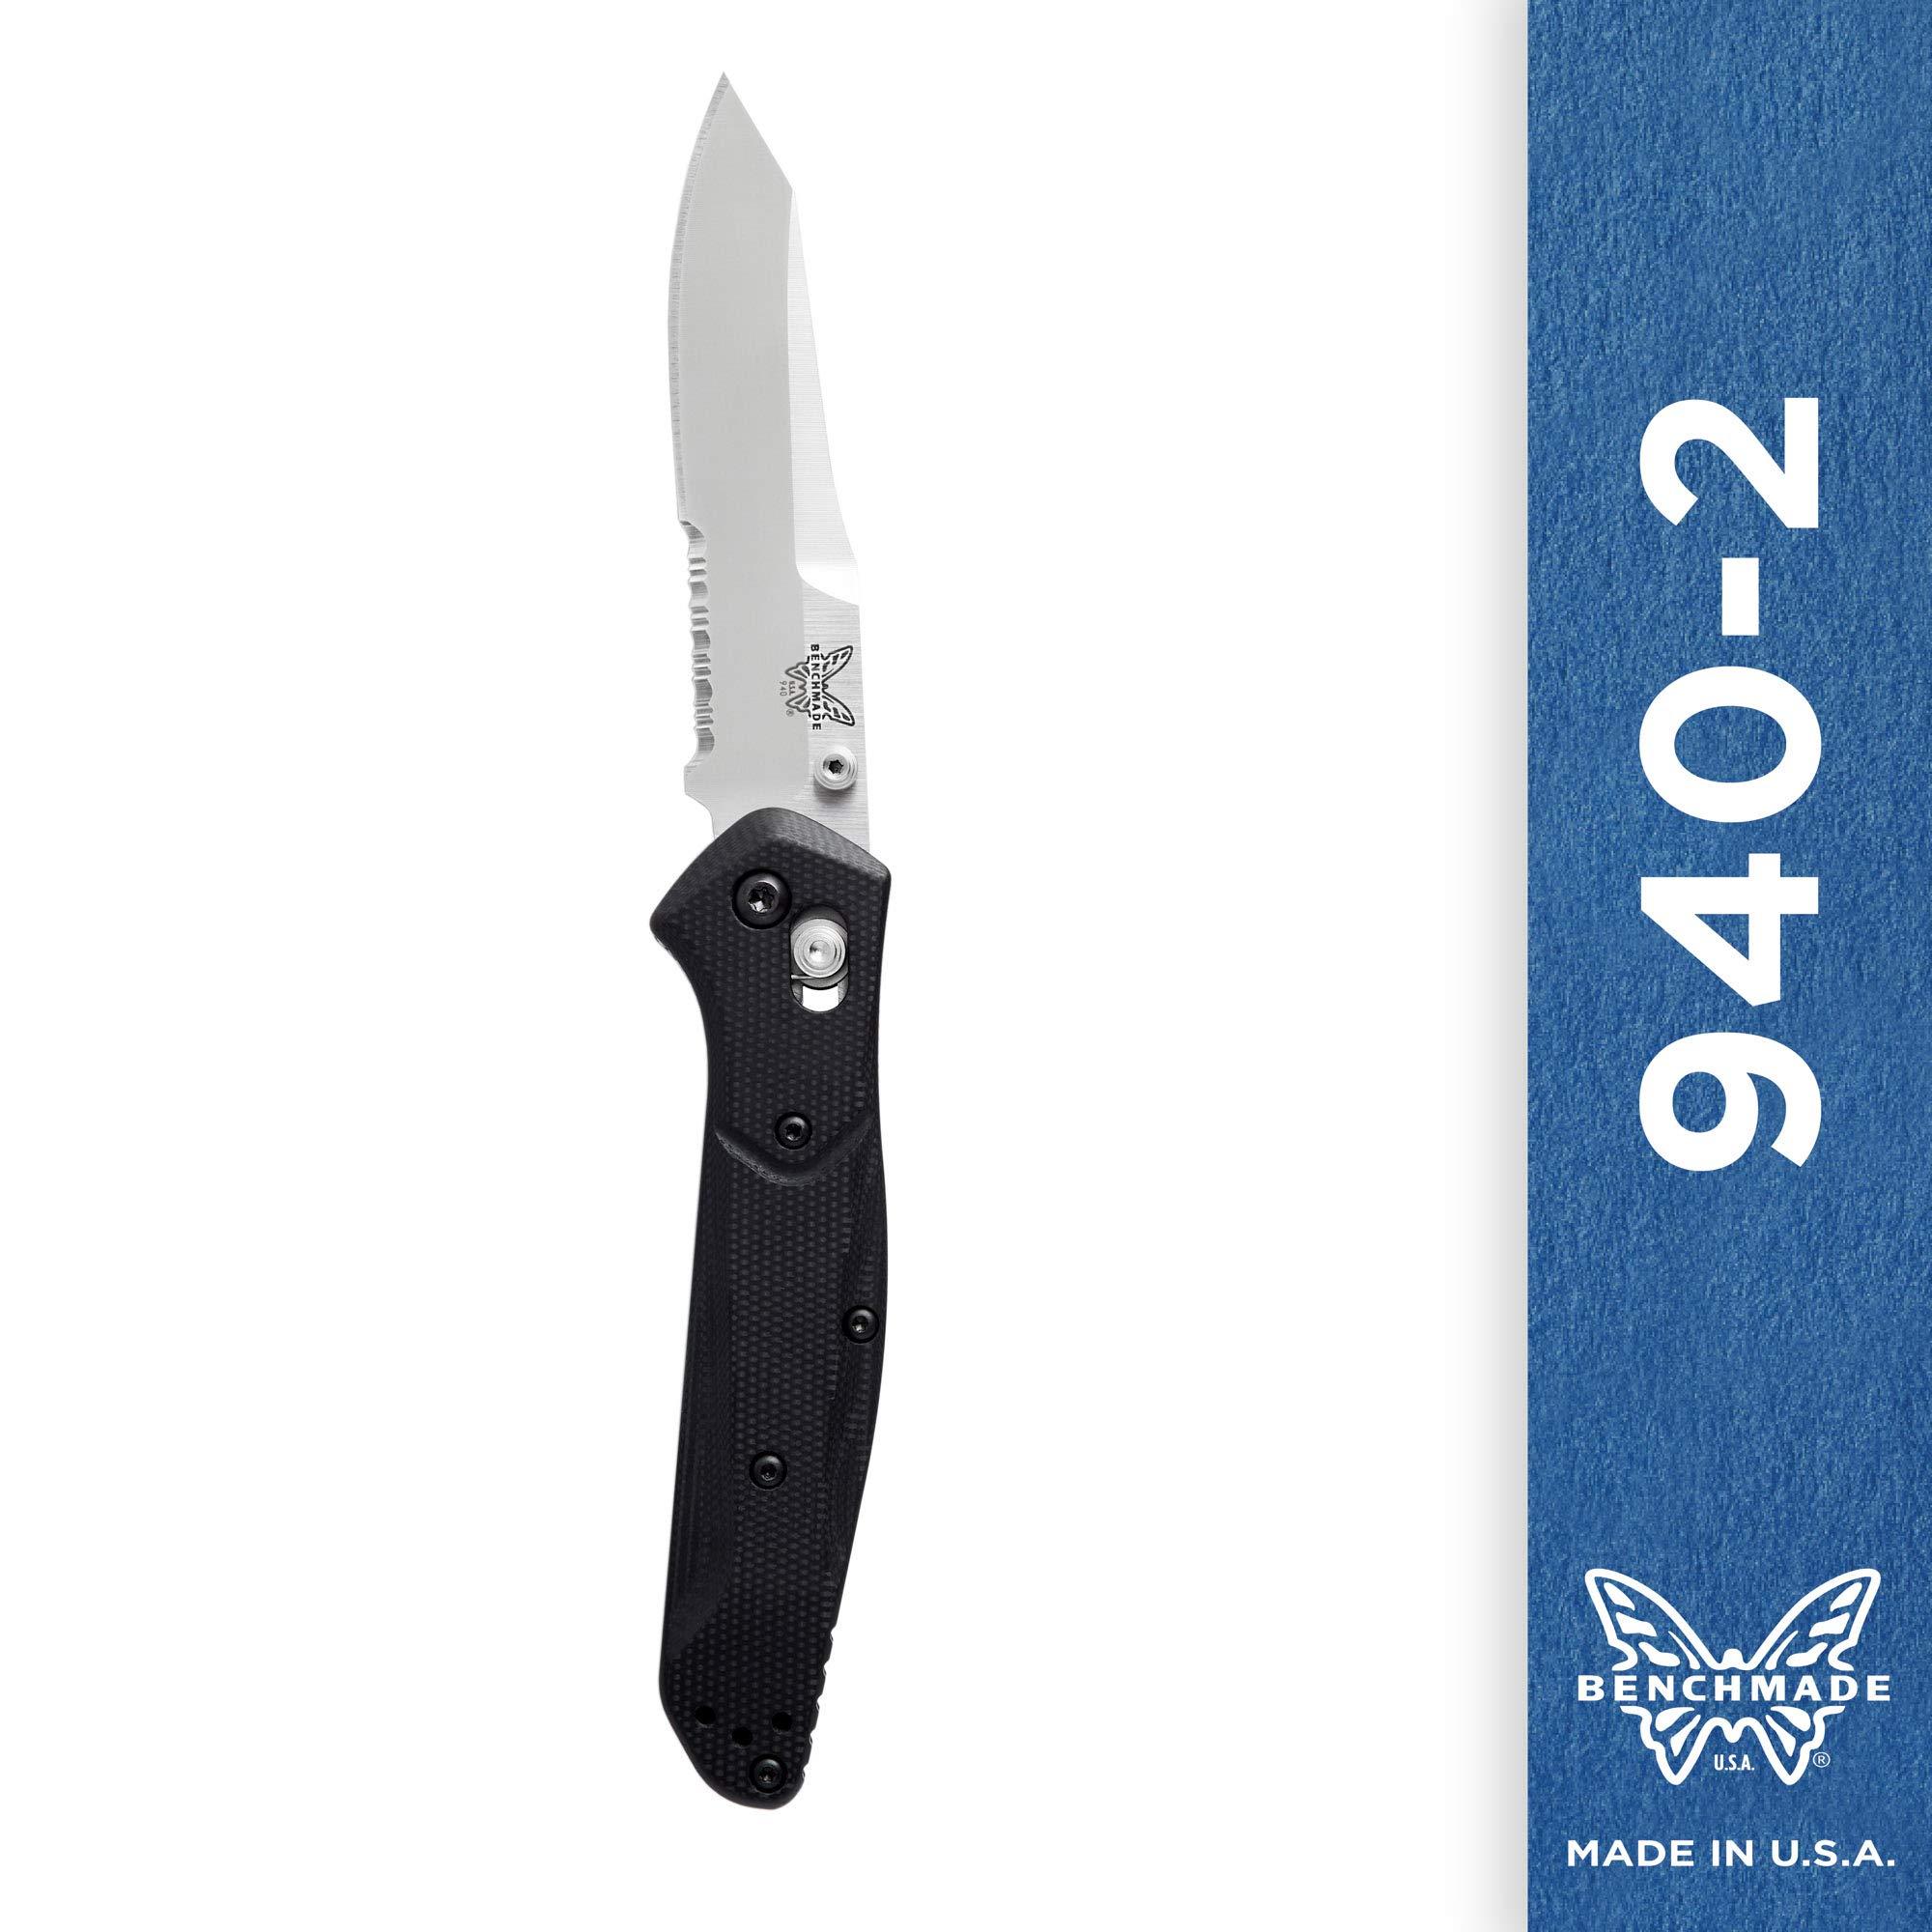 Benchmade - 940-2 Knife, Reverse Tanto Blade, Serrated Edge, Satin Finish, G10 Handle